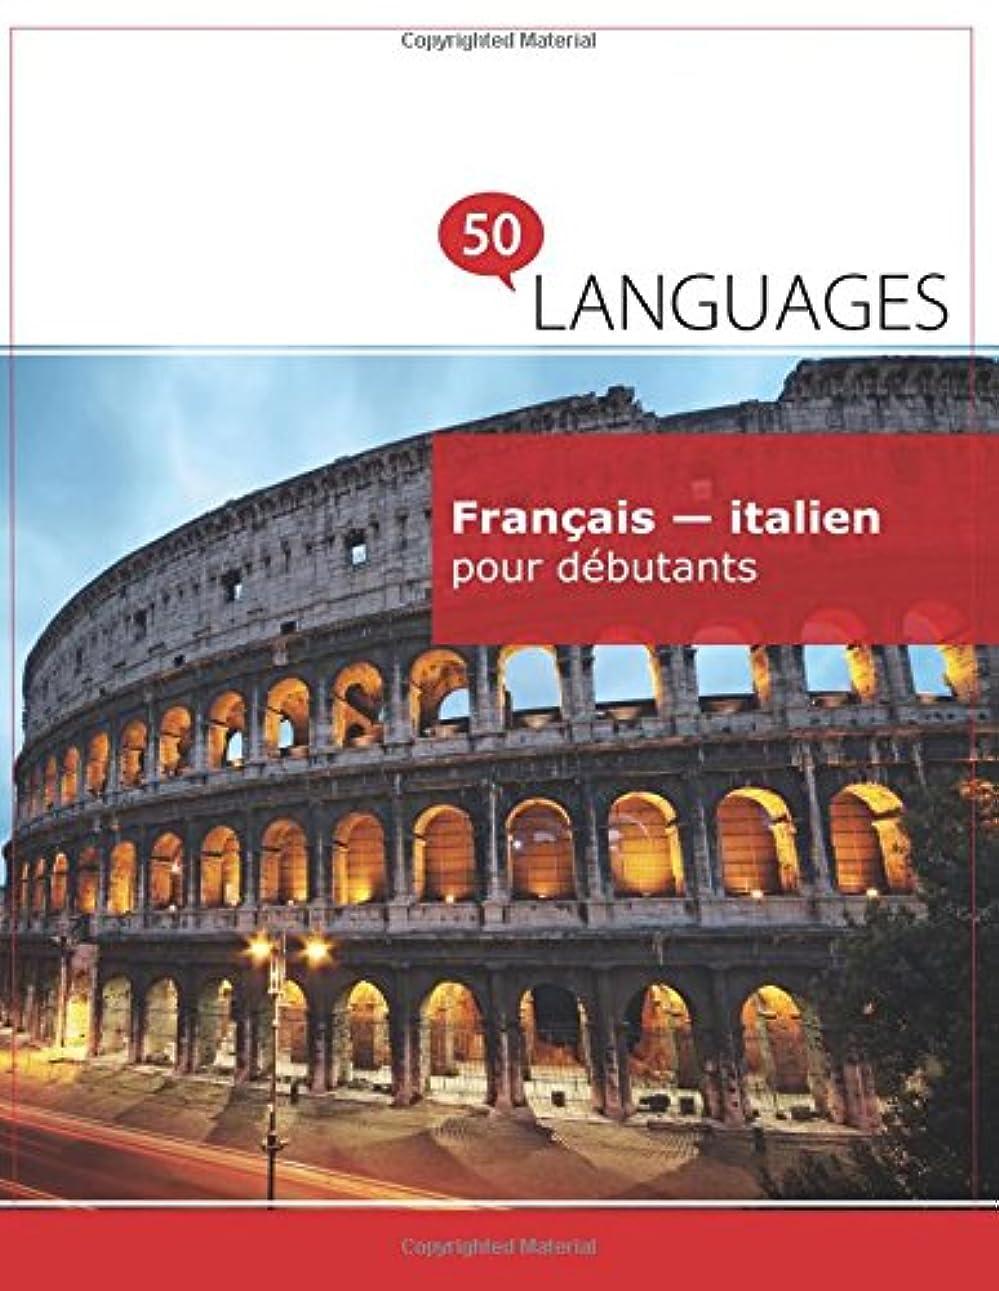 サラダ磁石図書館Fran?ais - italien pour débutants: Un Livre Bilingue